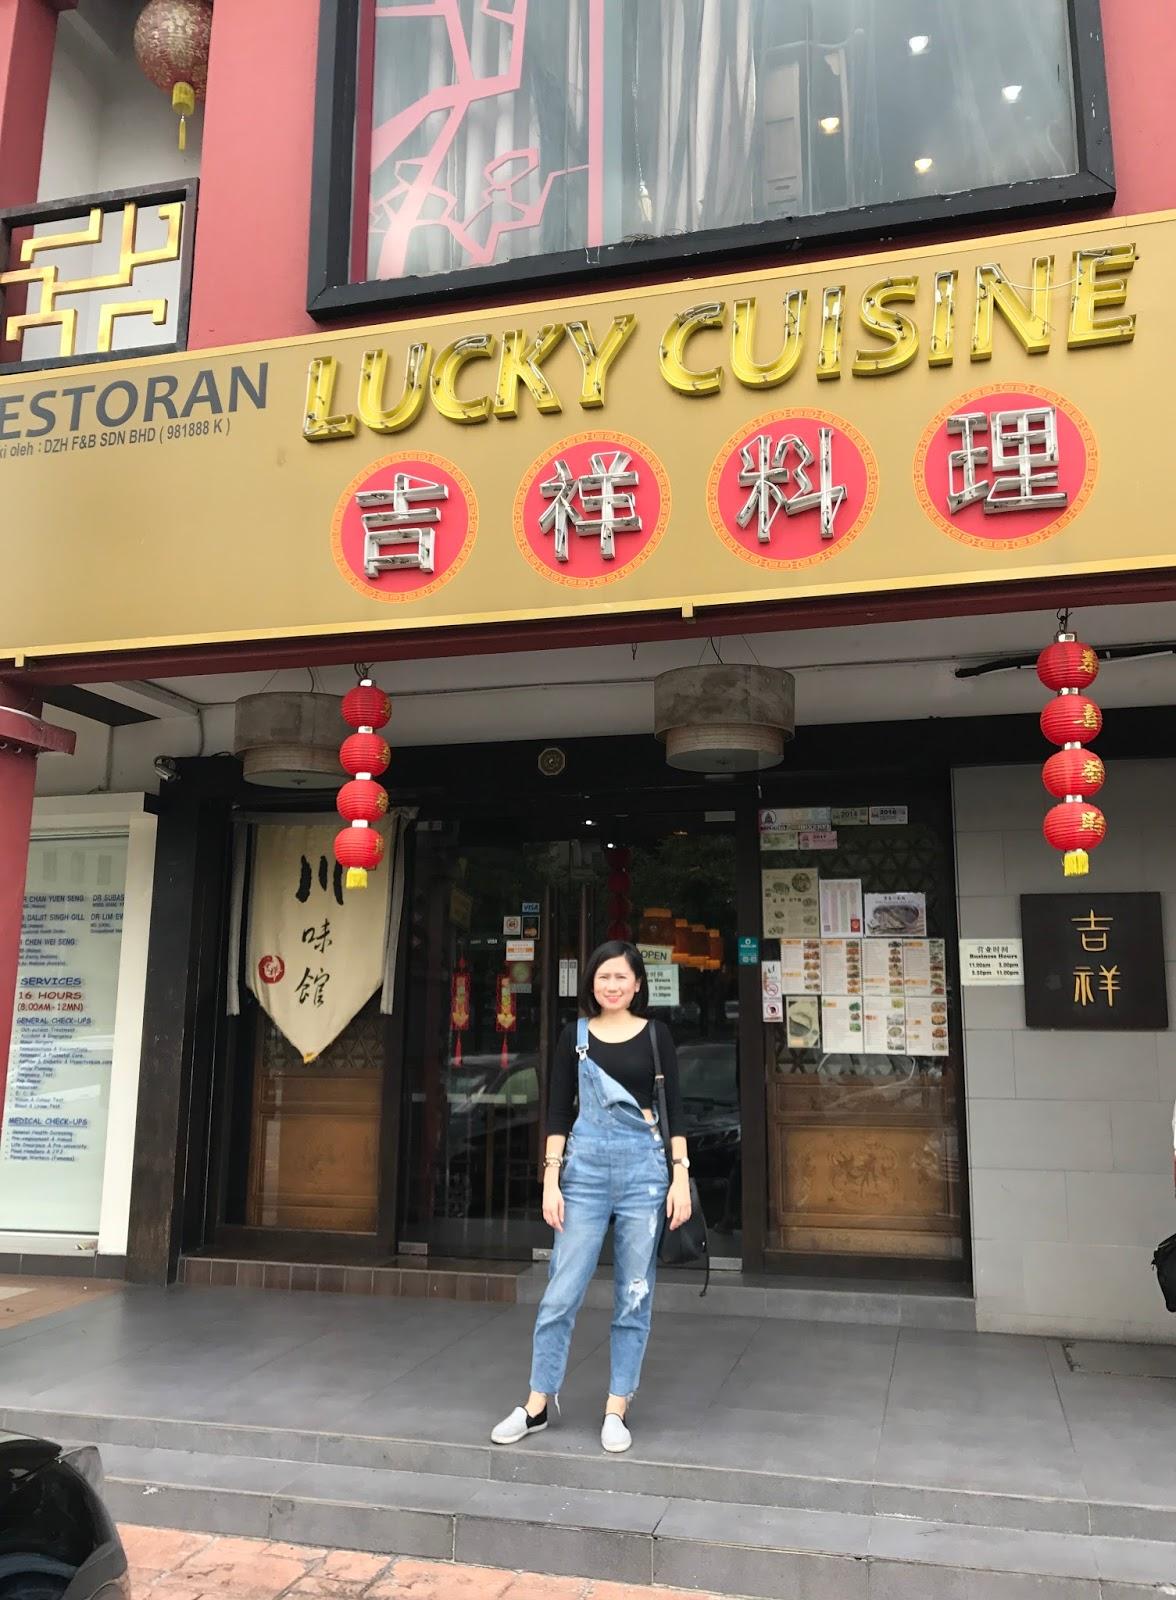 Lucky Cuisine Restaurant 吉祥四川菜馆 Lunch Set @ Kota Damansara